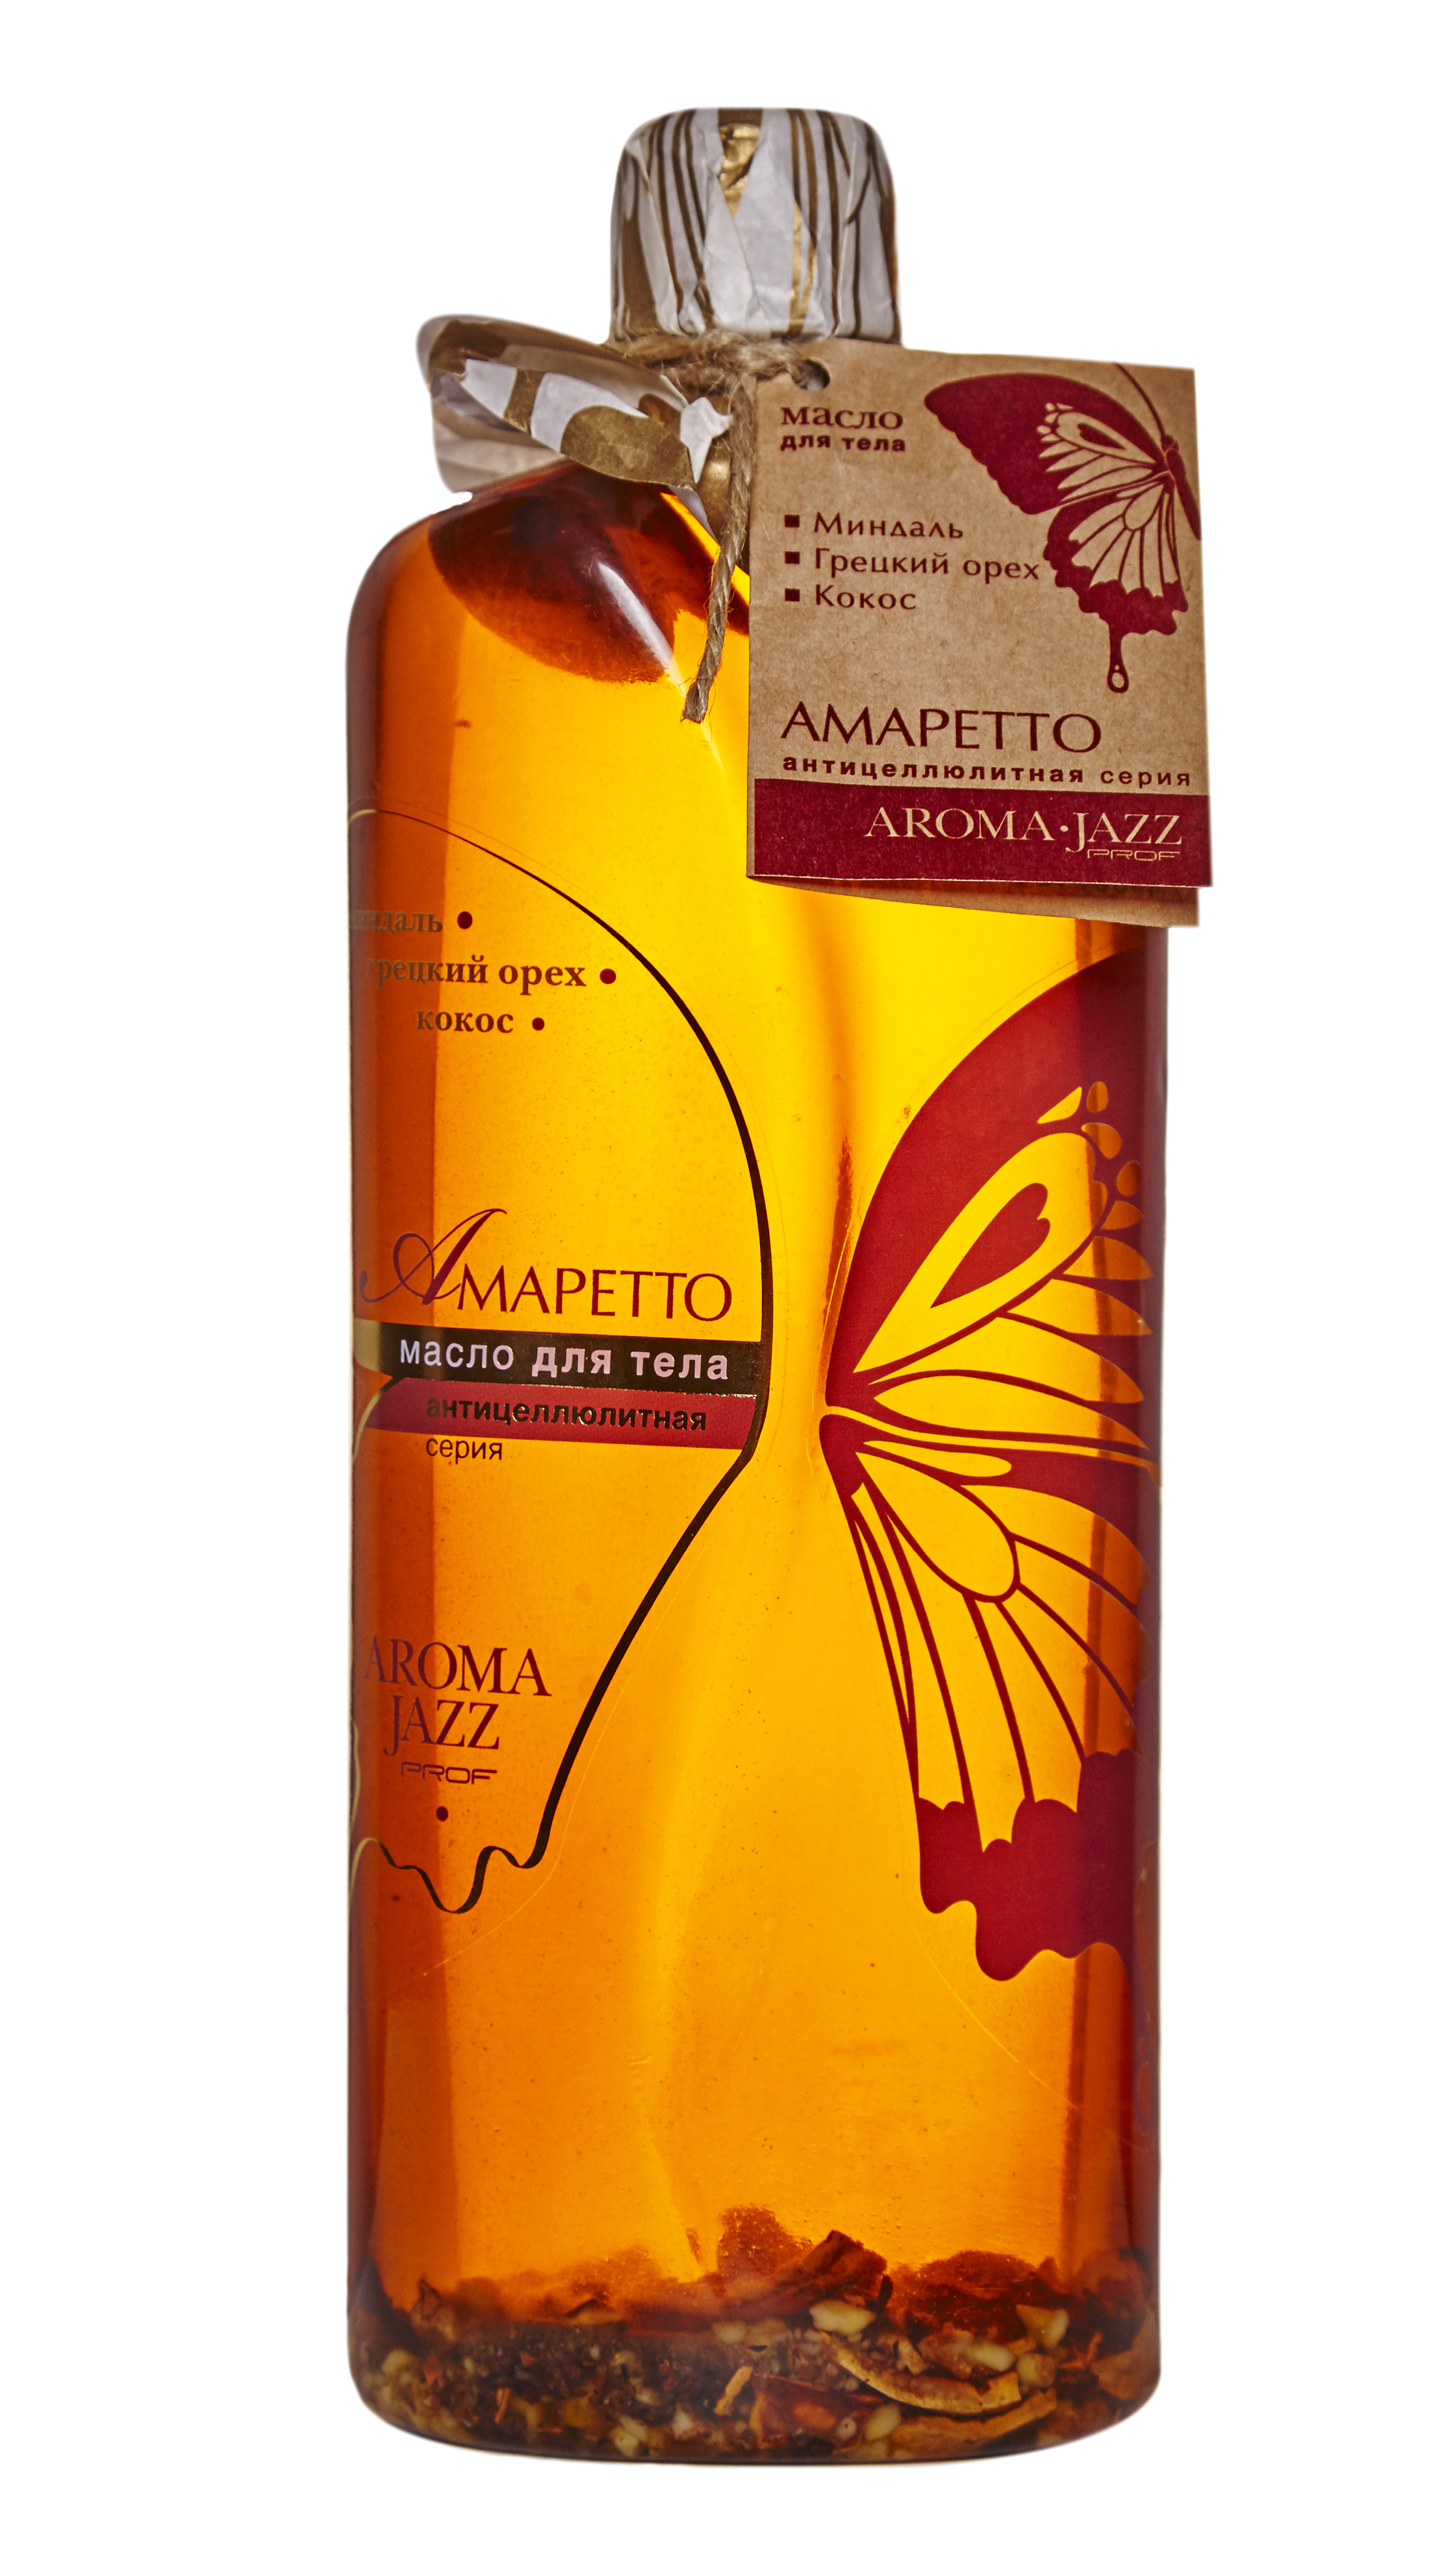 AROMA JAZZ Масло массажное жидкое для тела Амаретто 1000 мл - Масла